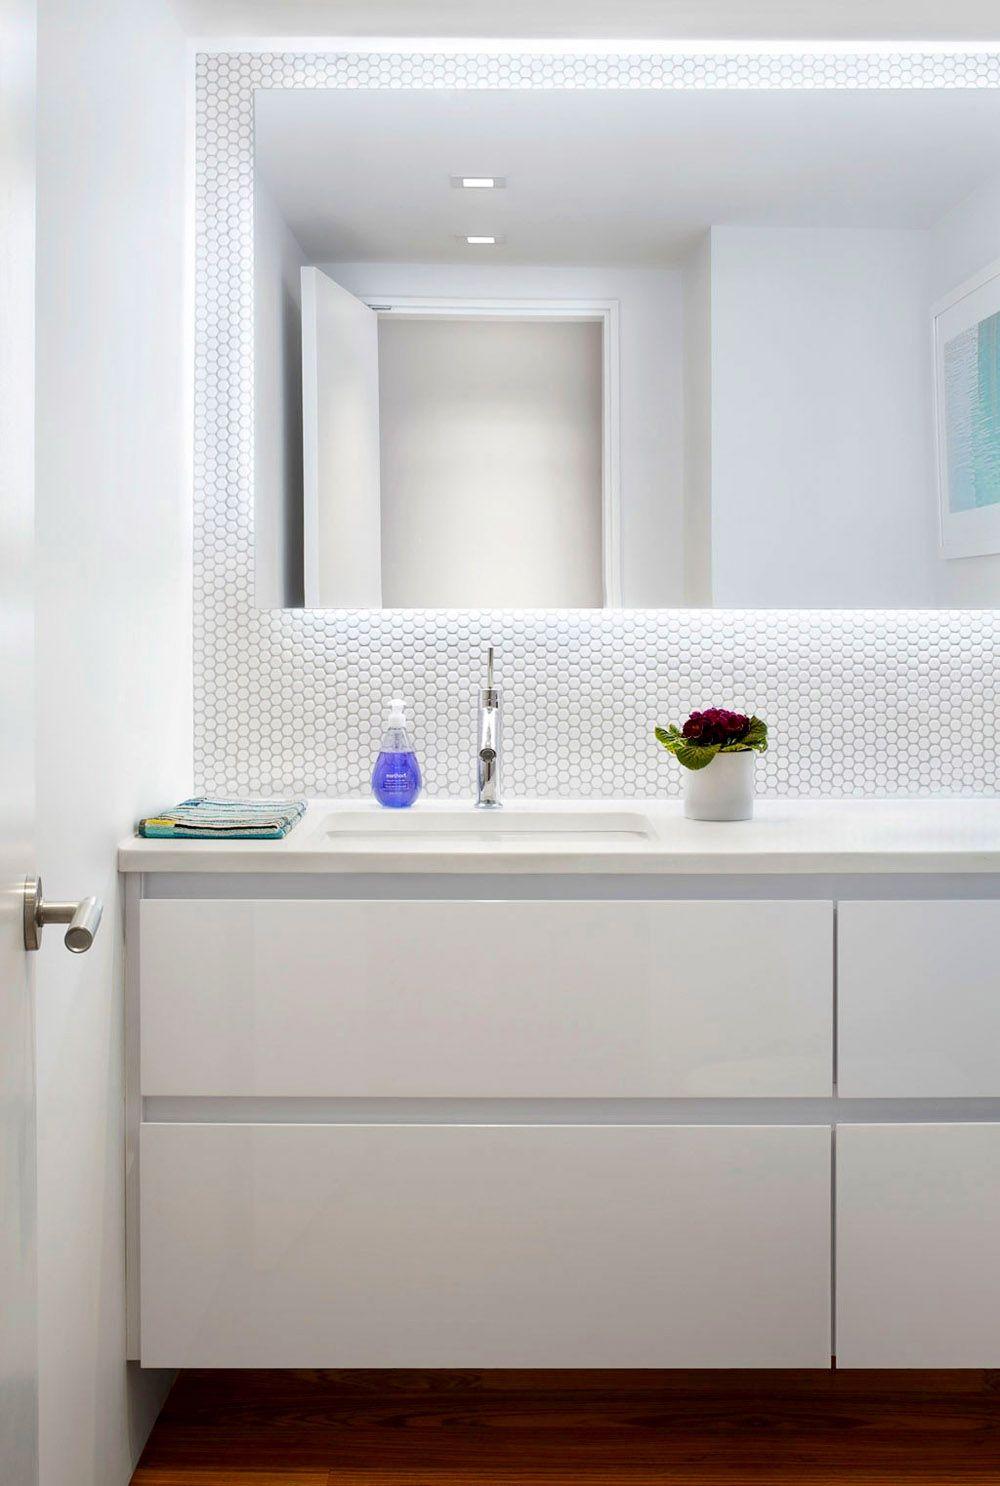 Светлый интерьер ванной комнаты, фото